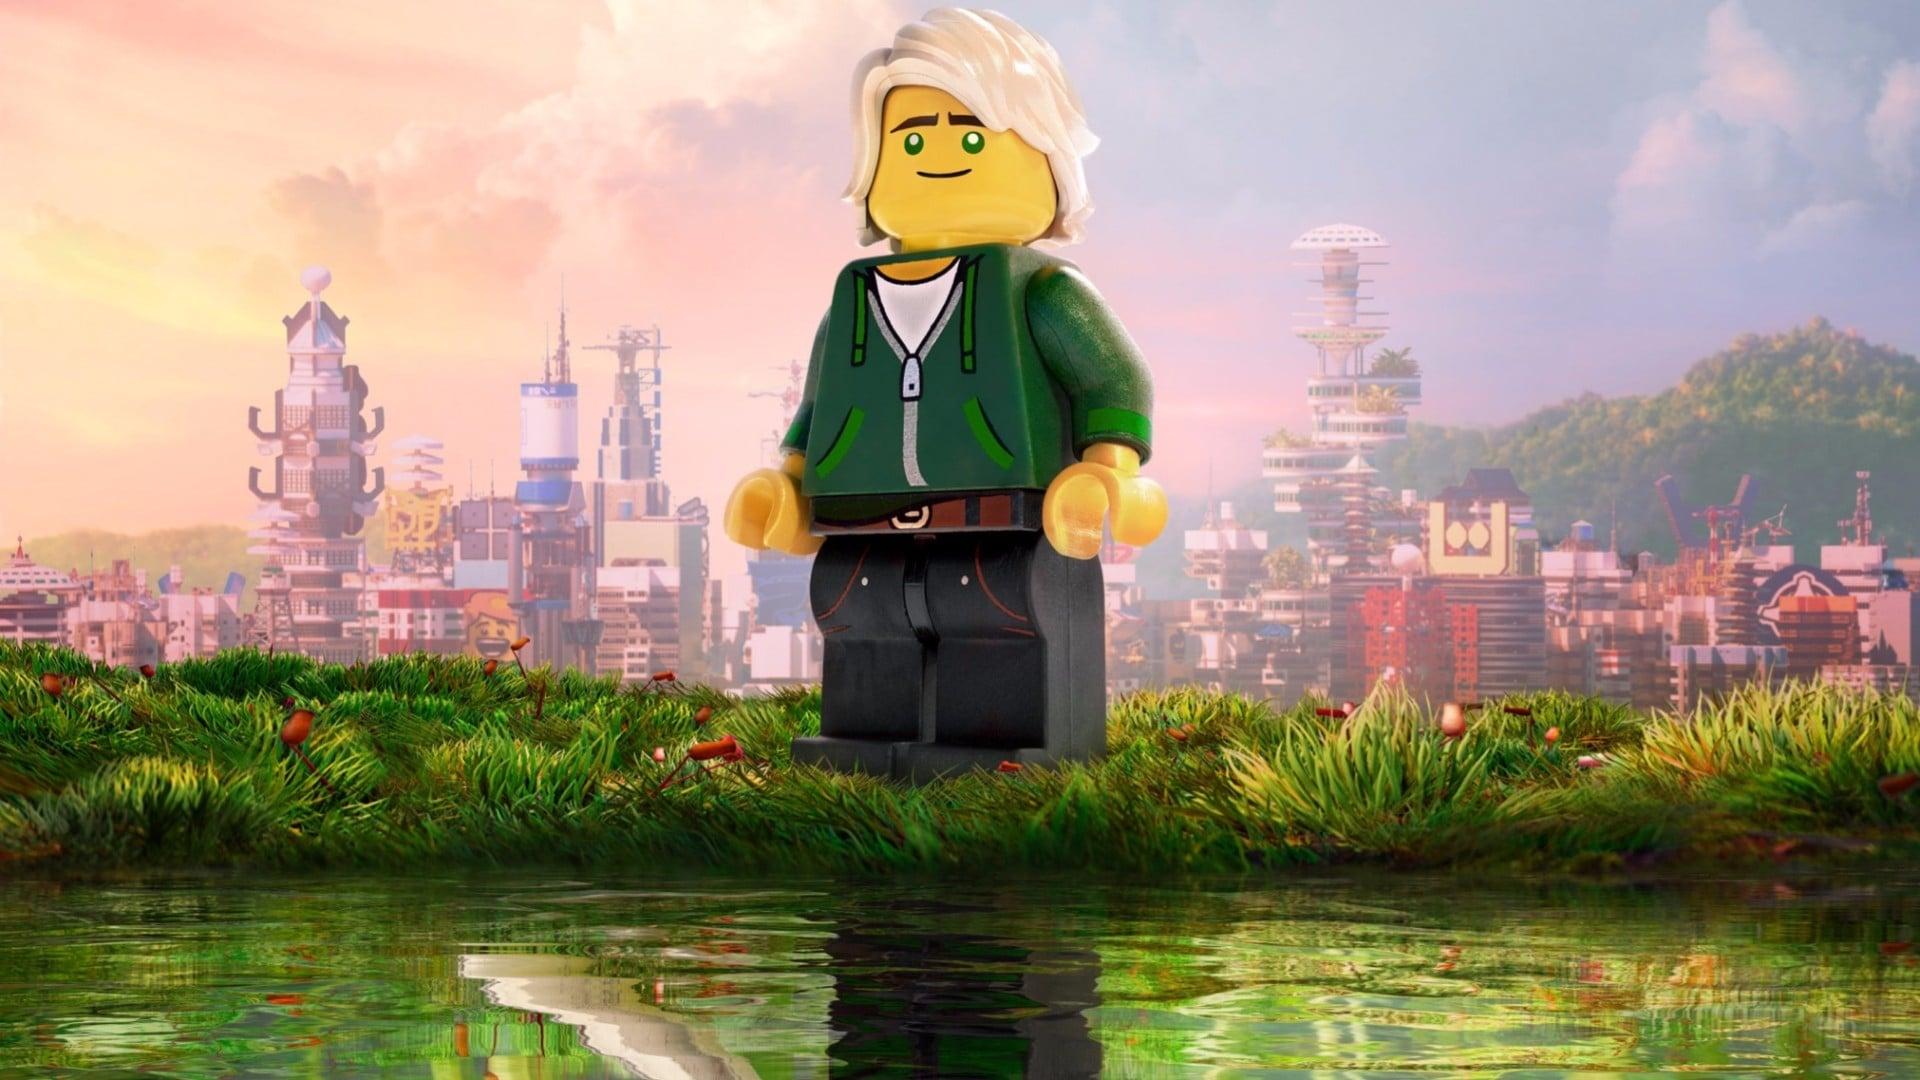 Watch The Lego Ninjago Movie 2017 Full Movie Stream Online Onionplay